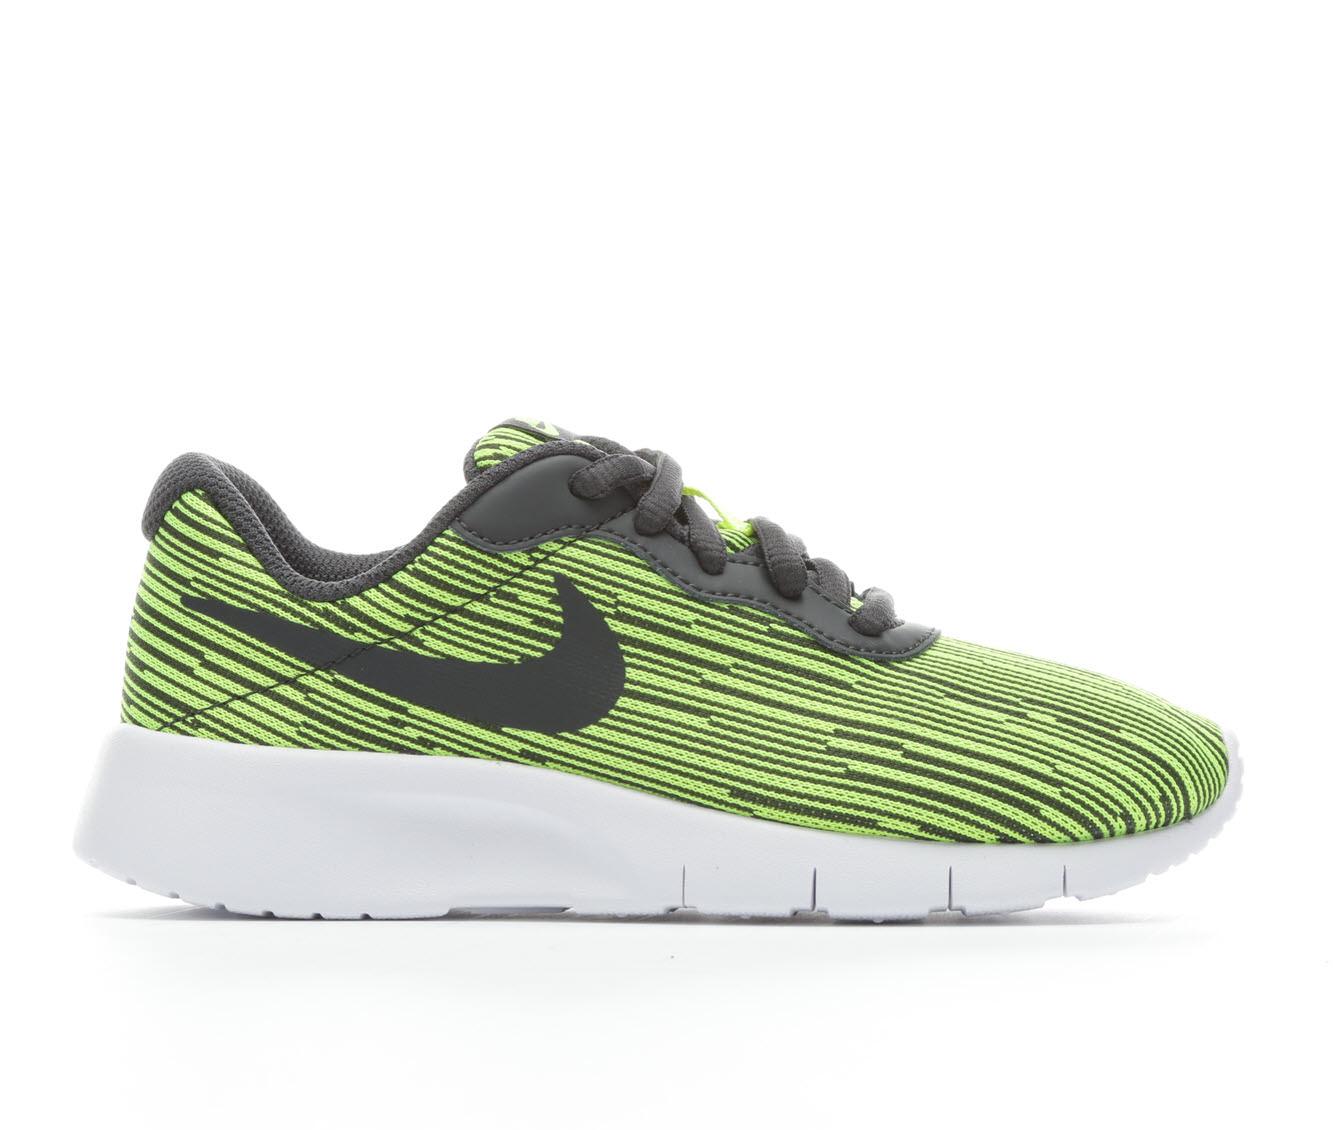 Boys' Nike Tanjun Special Edition Sneakers (Green - Size 10.5 - Little Kid) 1657121